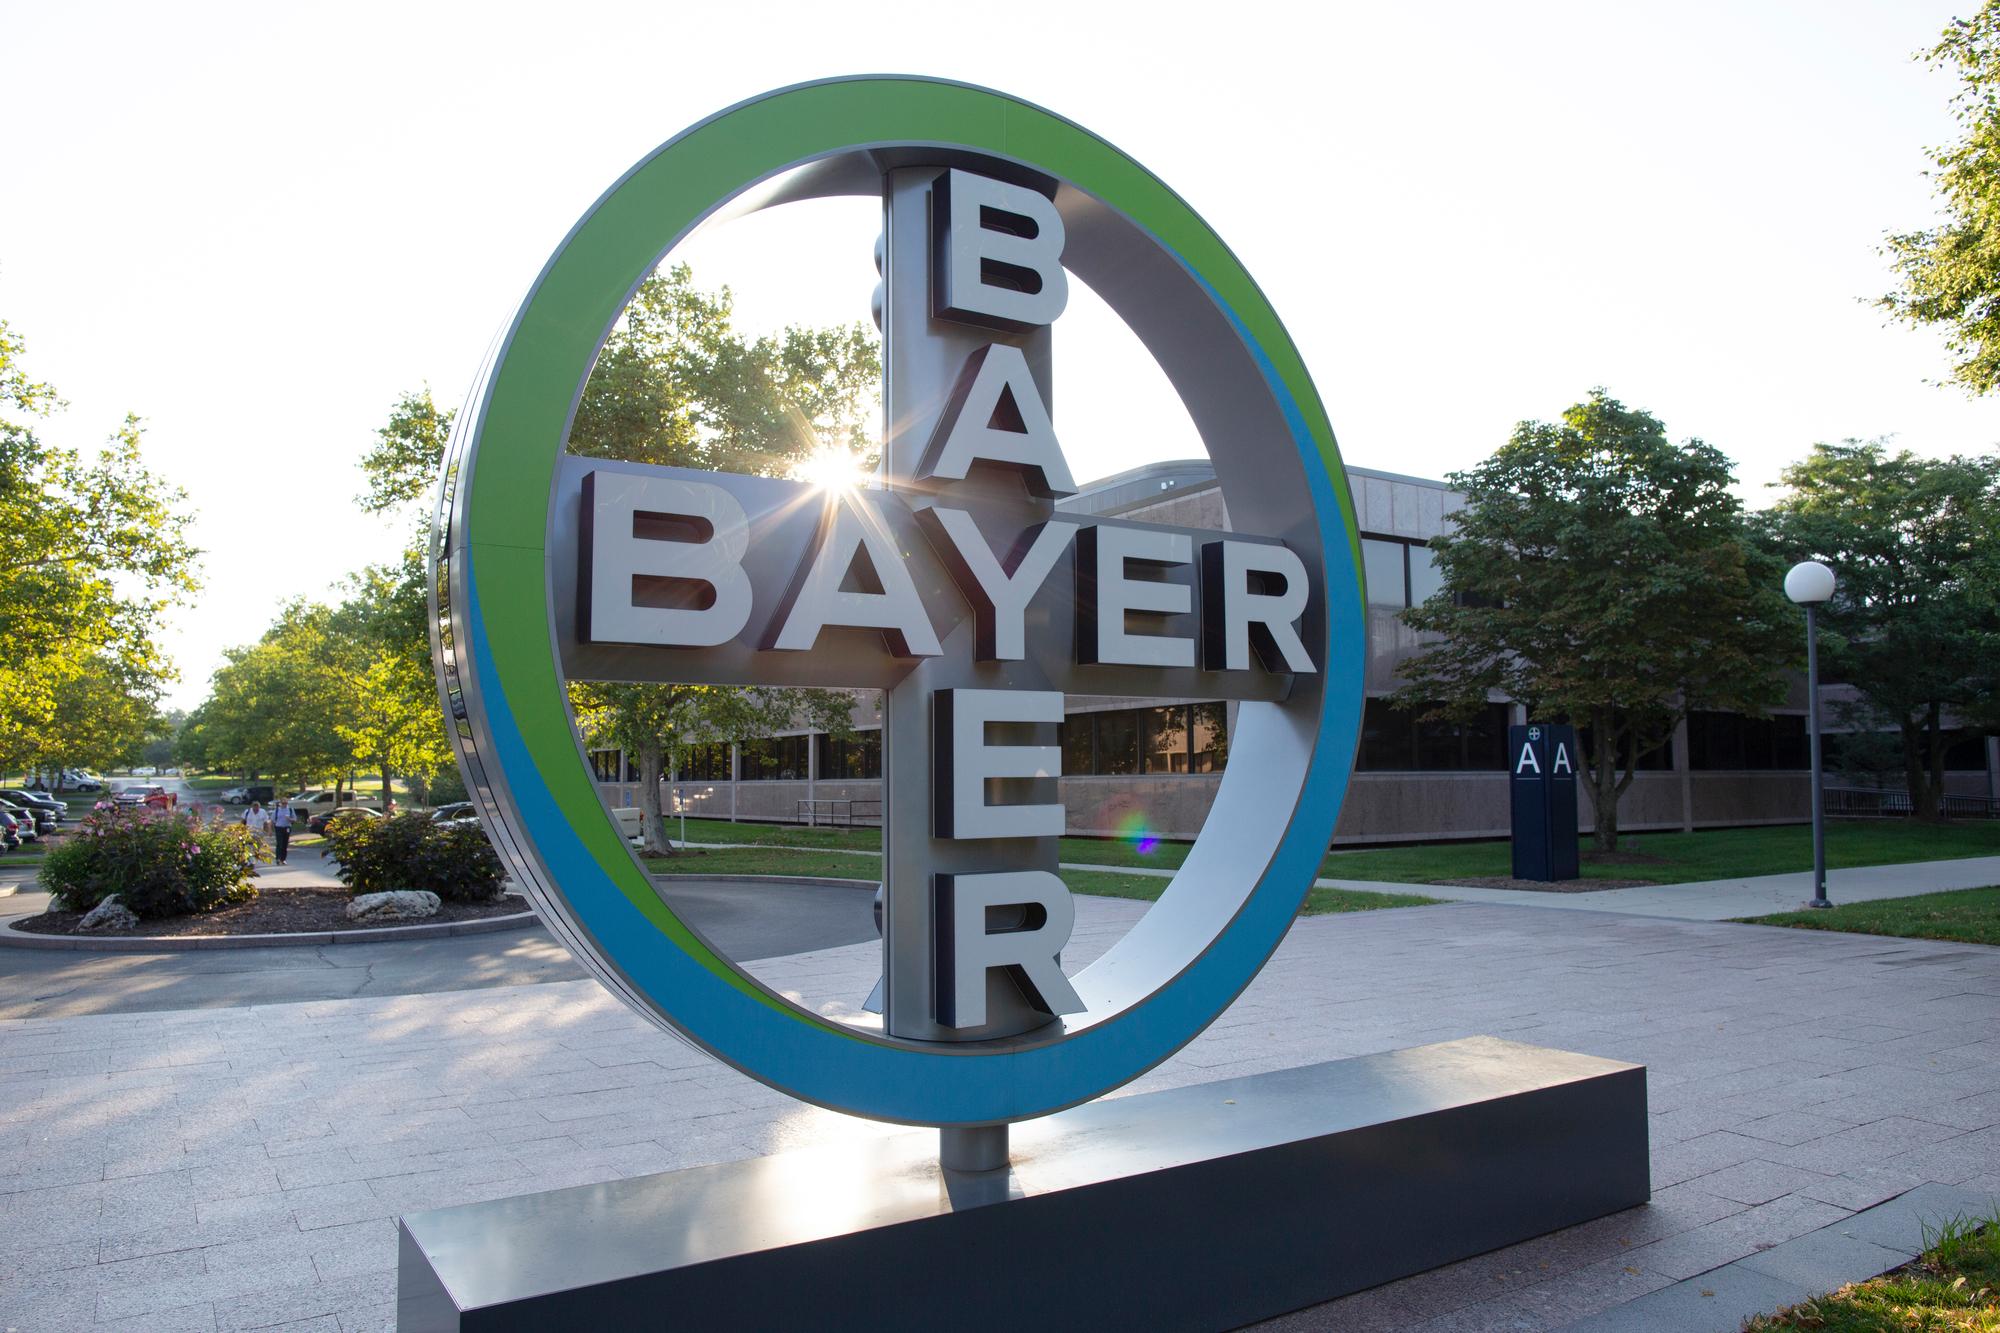 Bayer apoia a UNICEF em projeto contra Covid-19